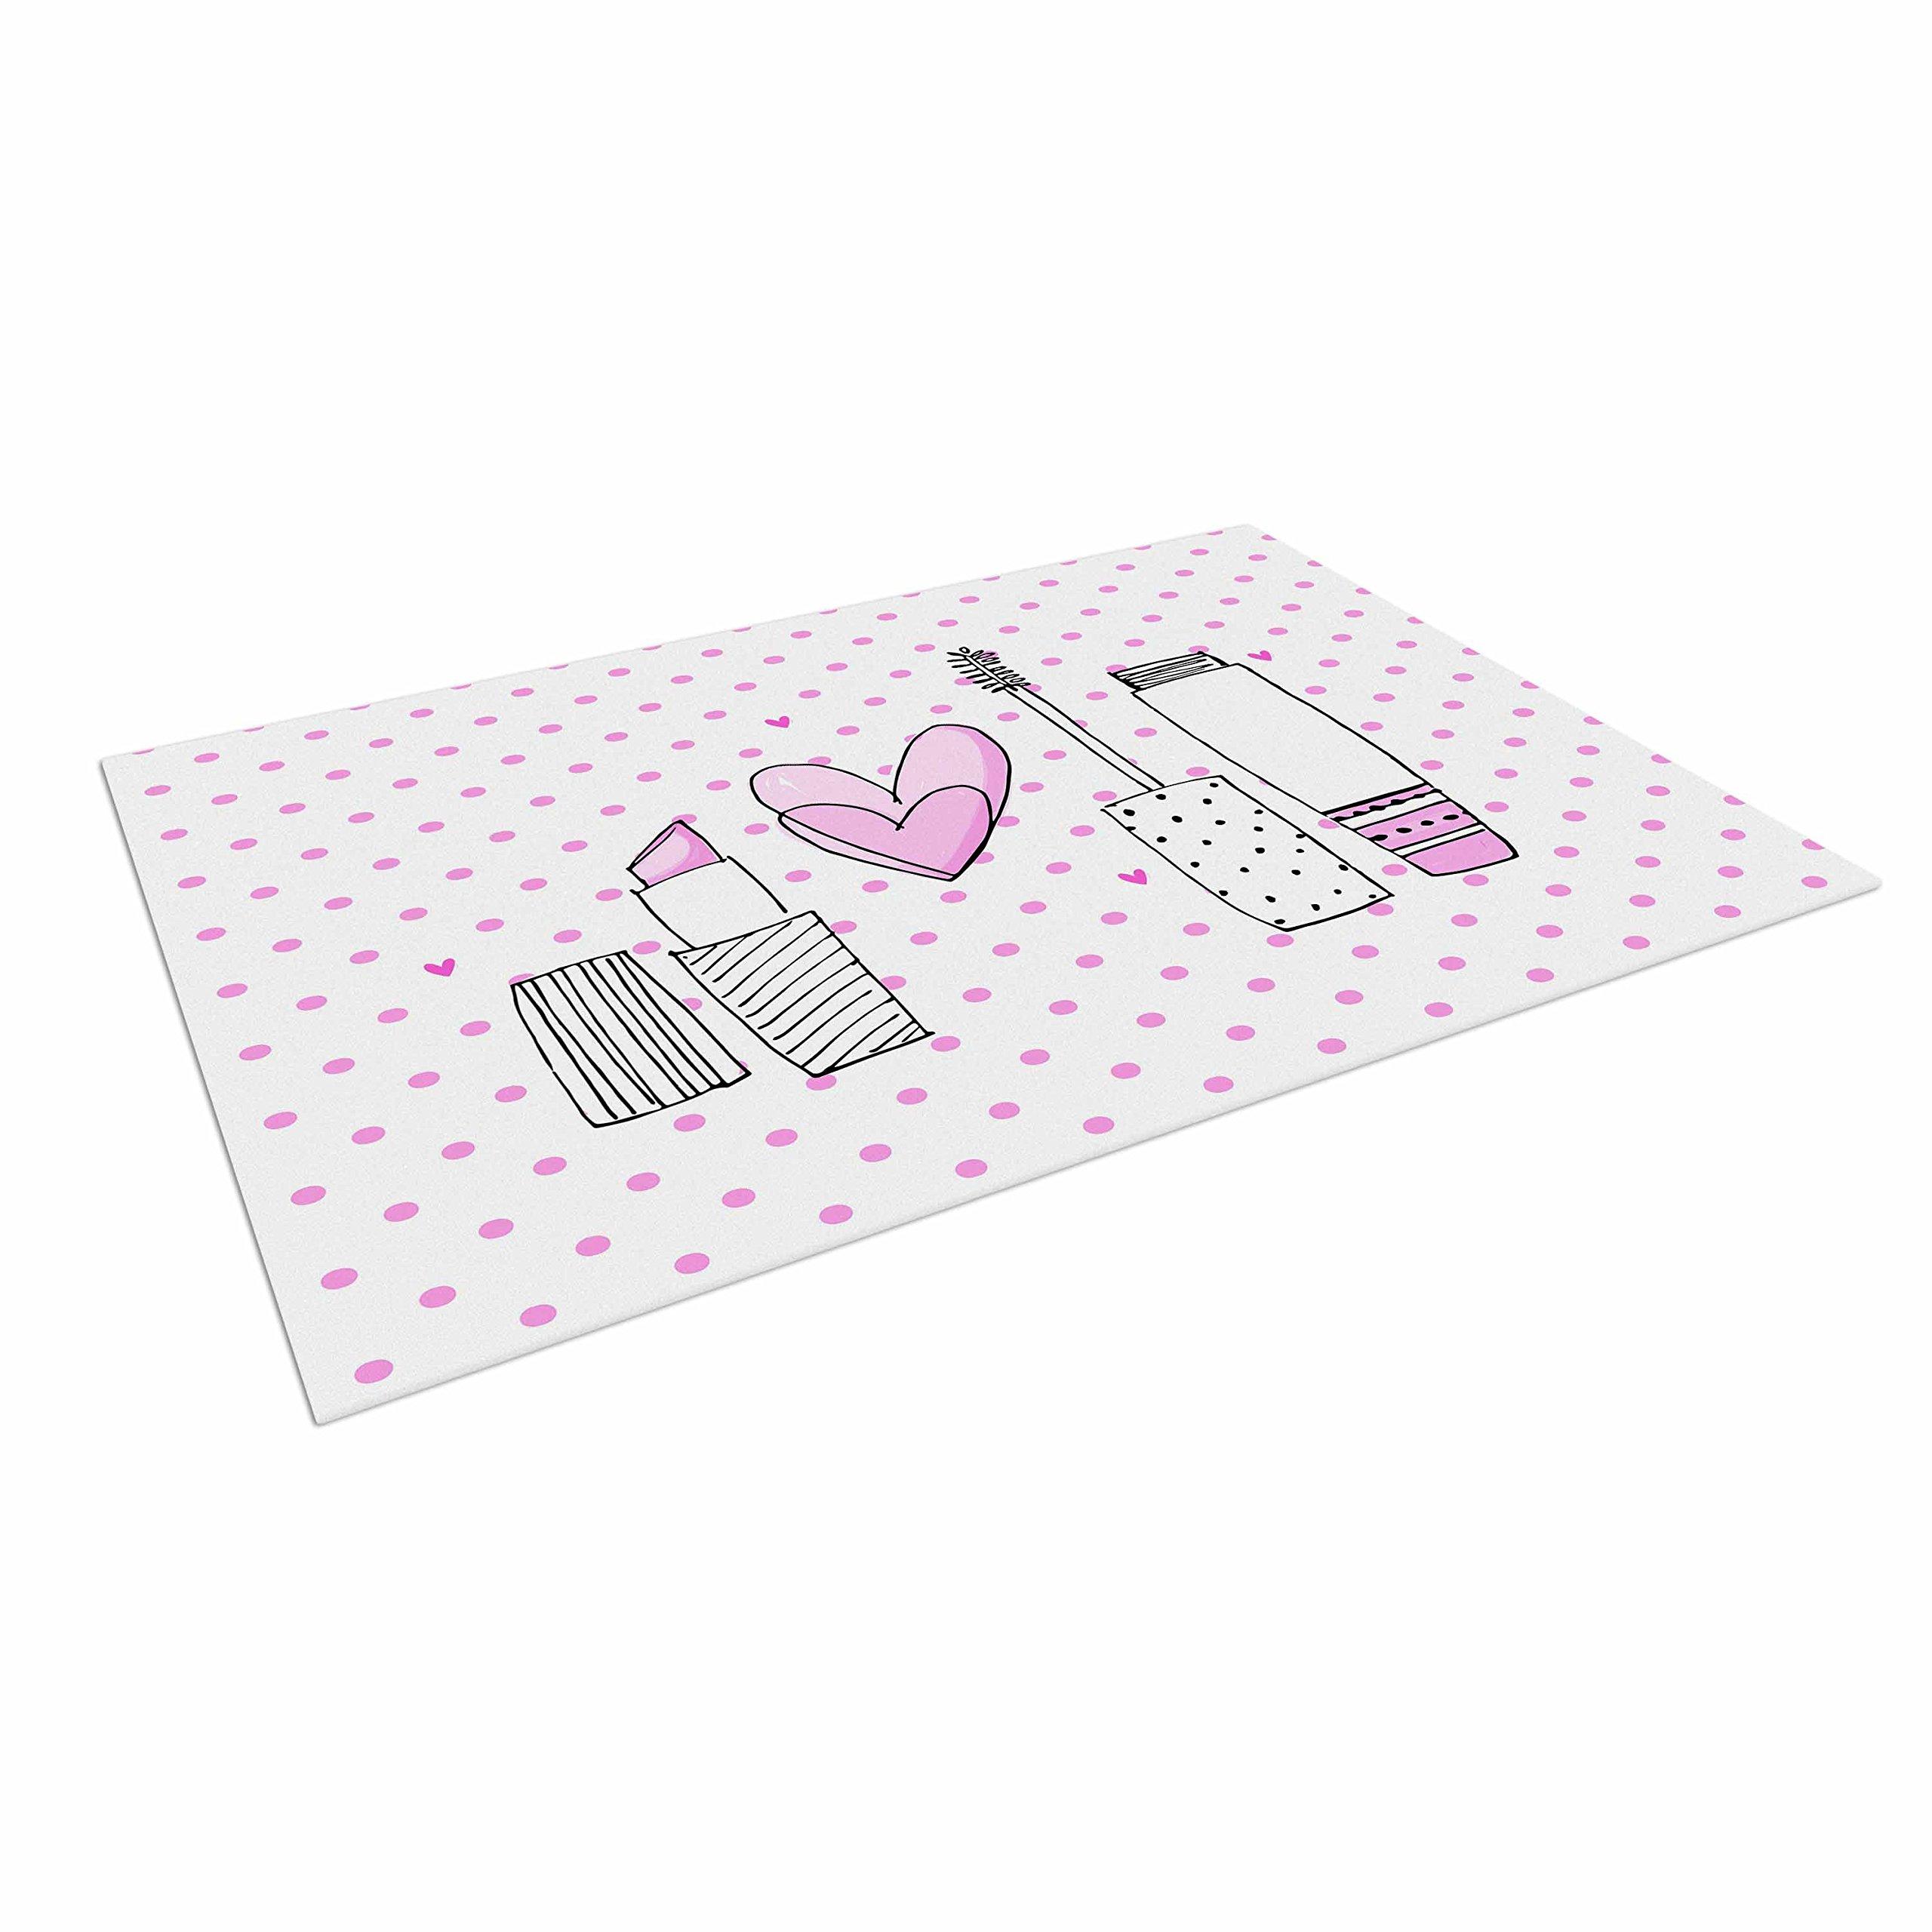 KESS InHouse Majobv ''Girls Luv'' Pink Makeup Outdoor Floor Mat, 4' x 5'